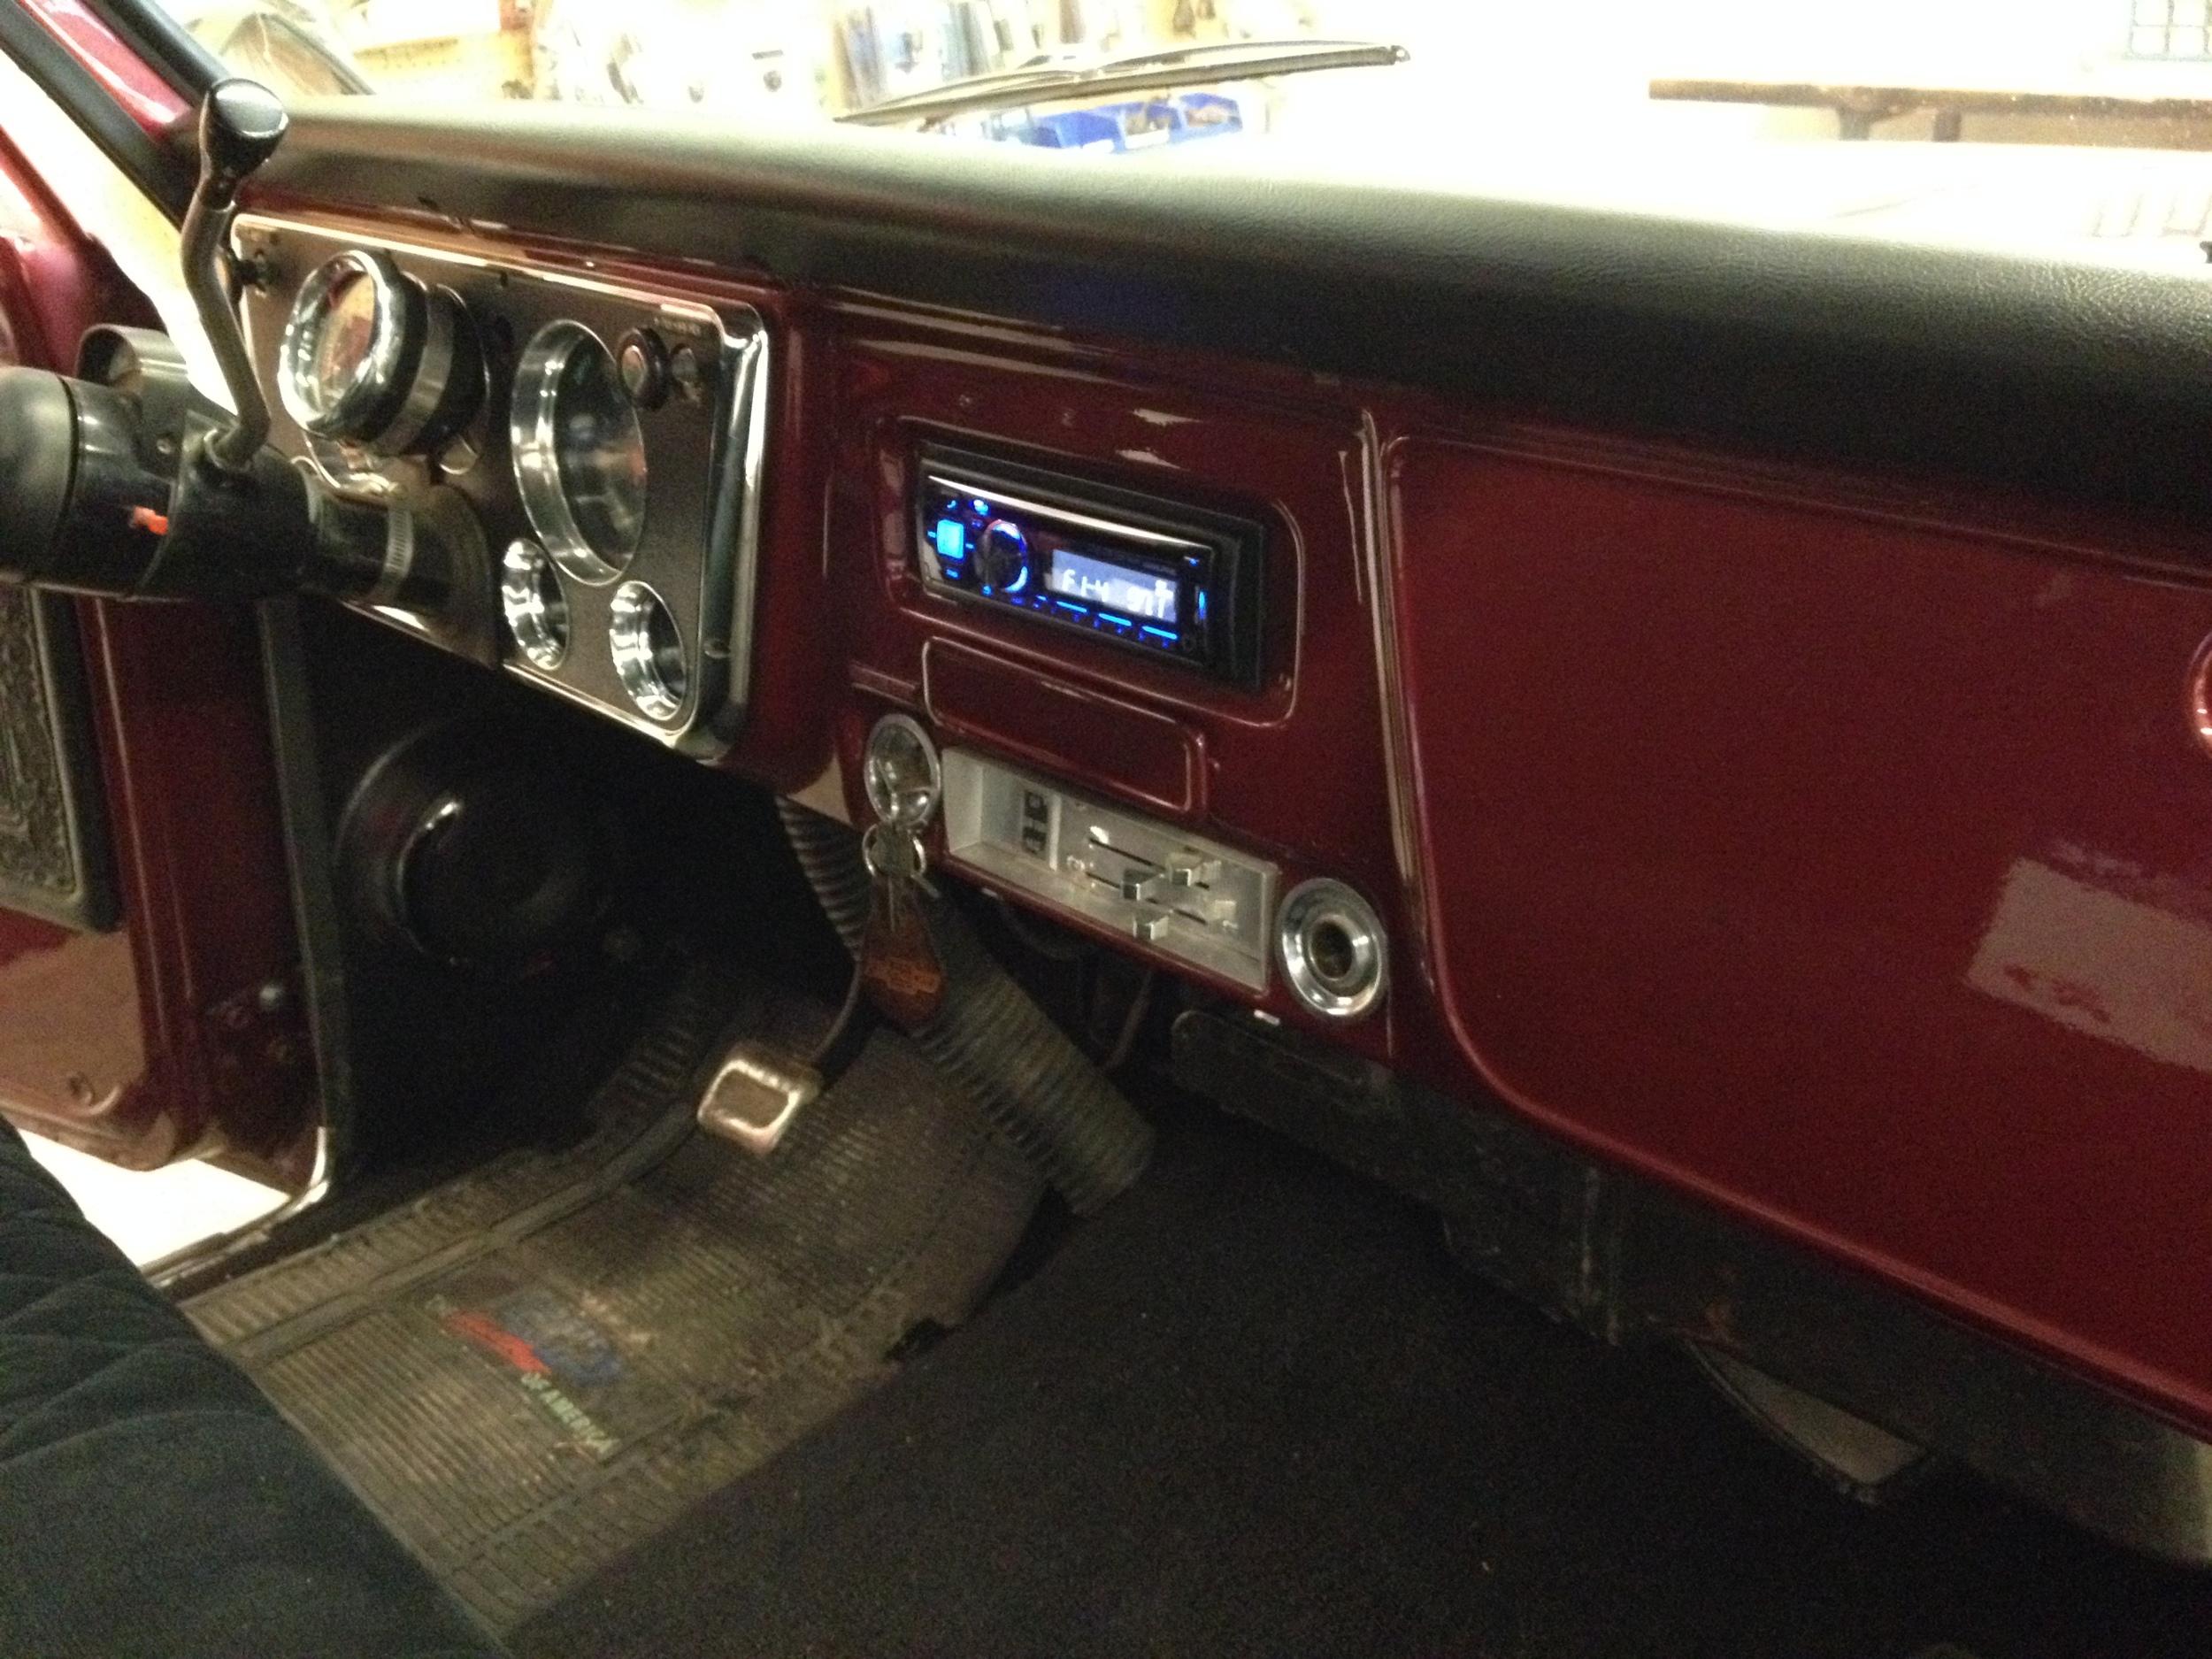 1969 Chevy C10 - Alpine CD Bluetooth Receiver & Alpine Type R Kick Panel Speakers